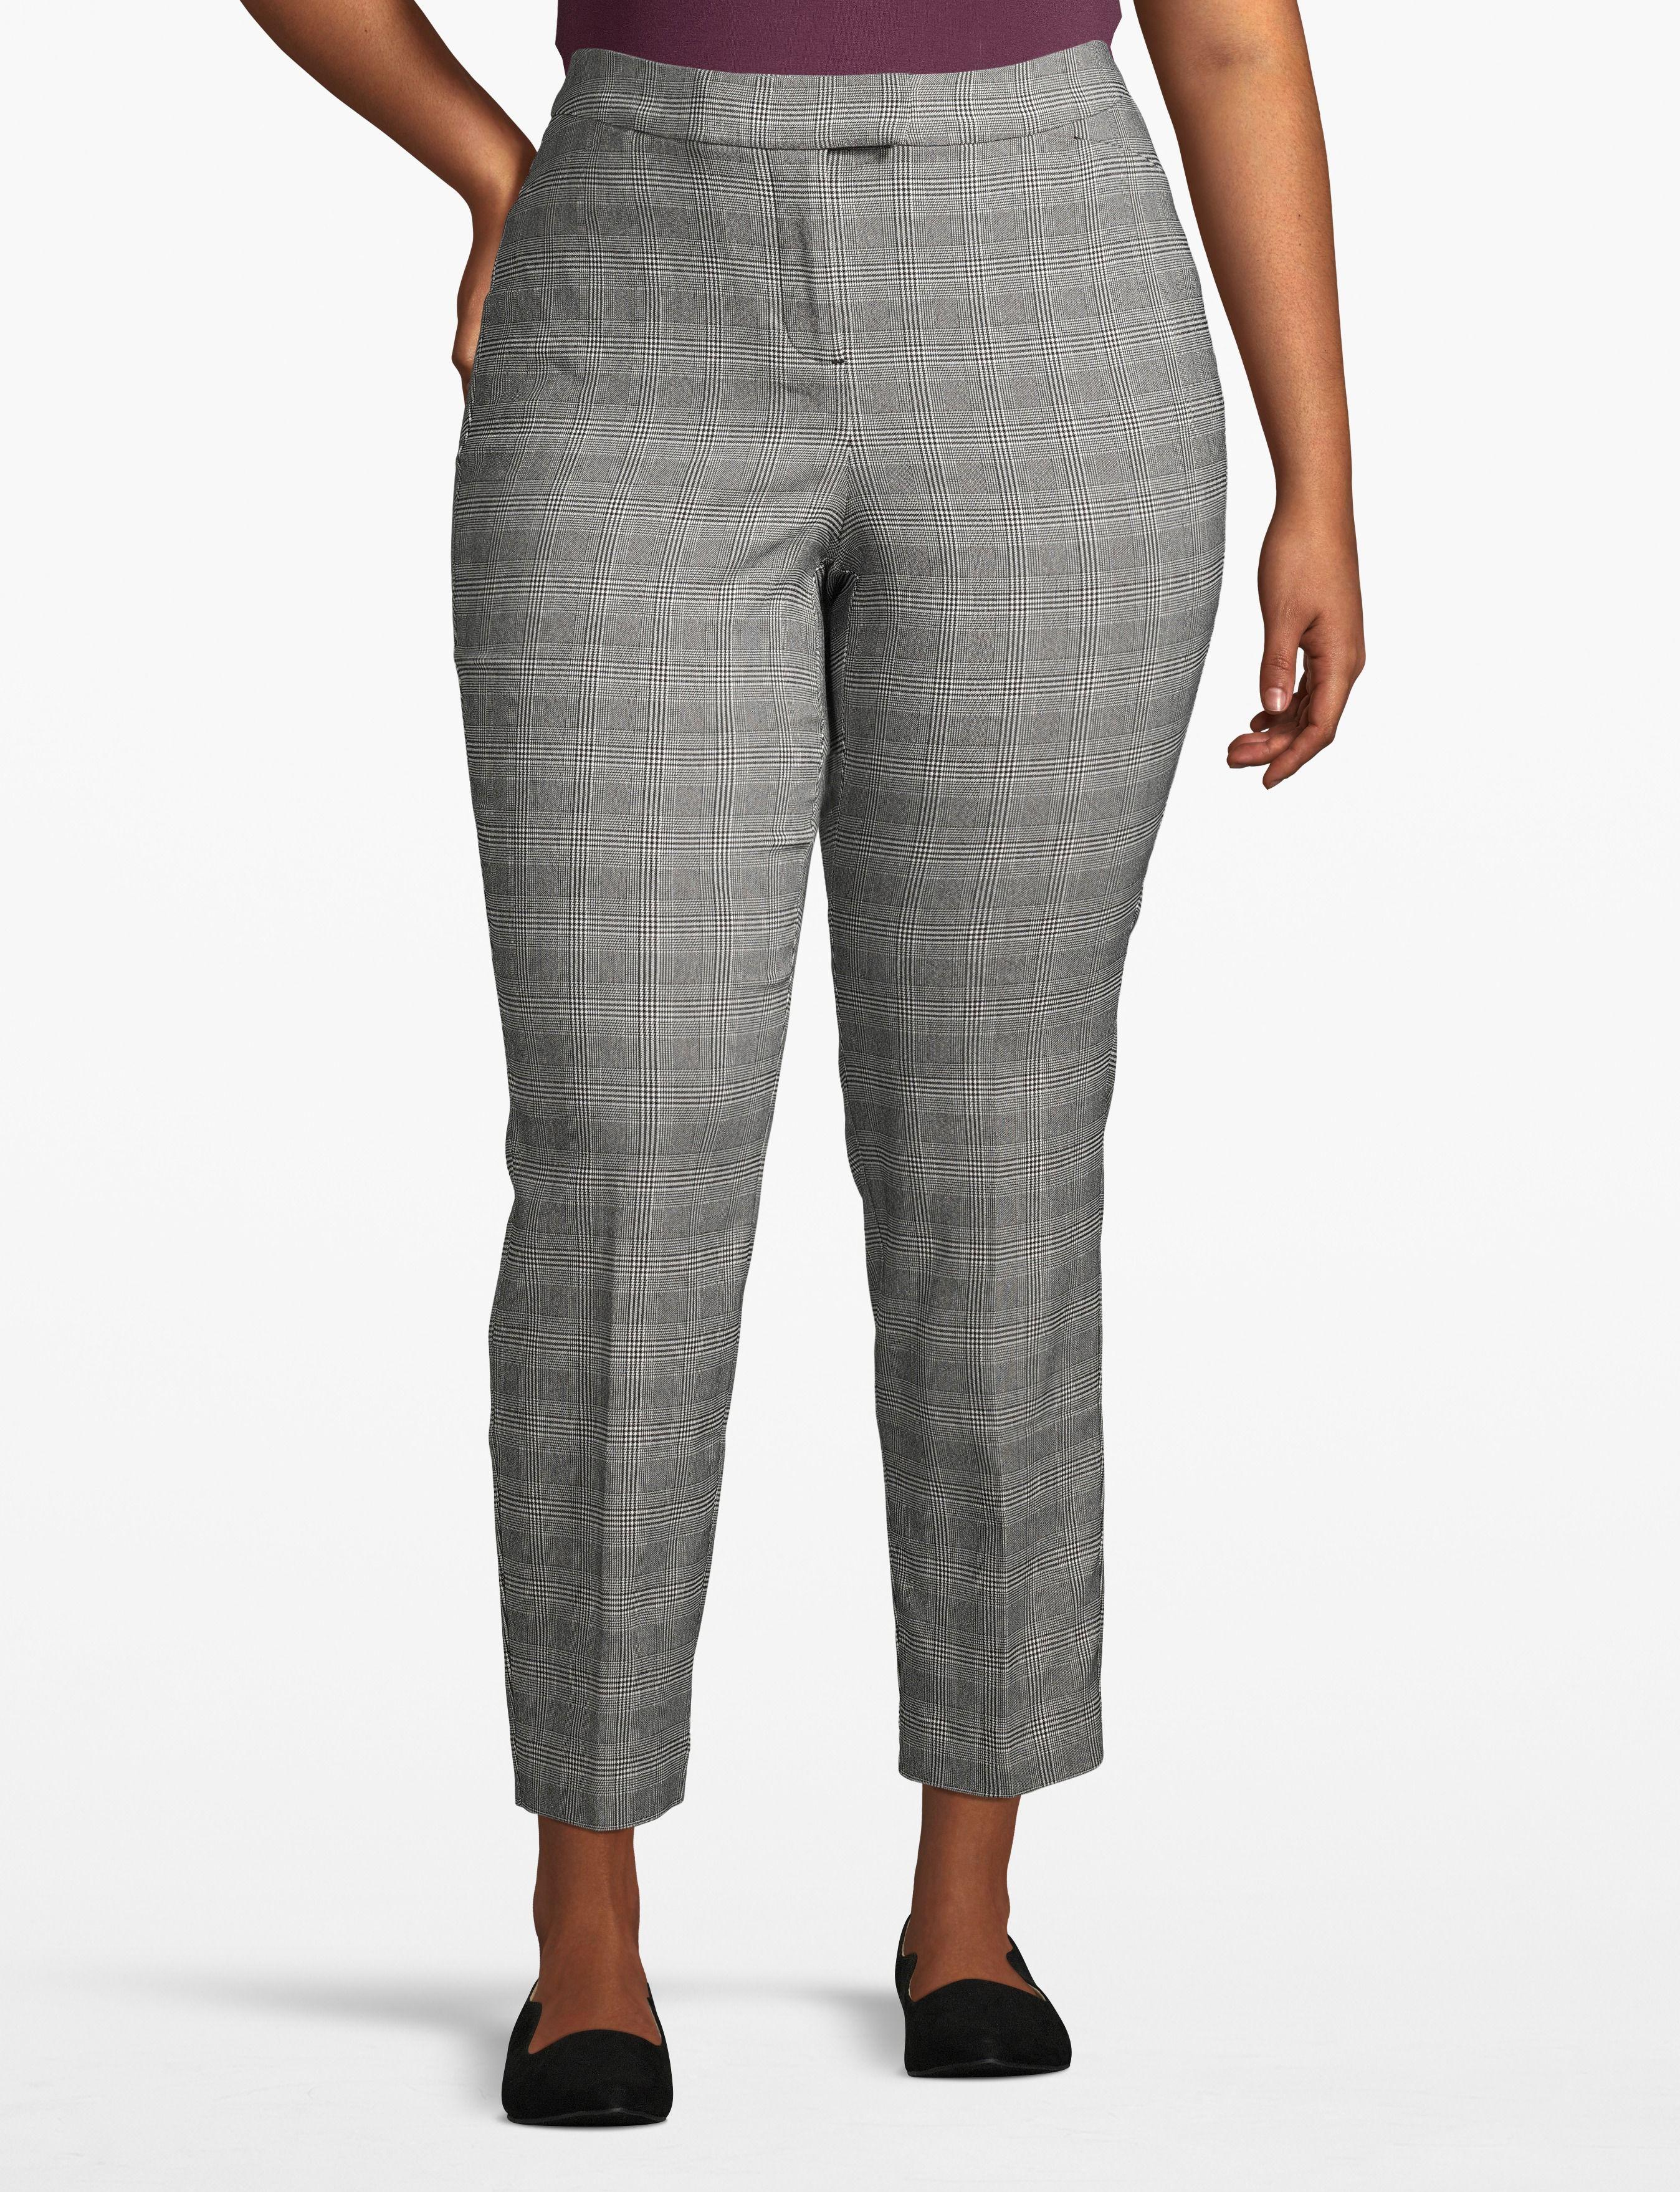 lane bryant women's lane essentials madison ankle pant - plaid 28 black/white glenplaid